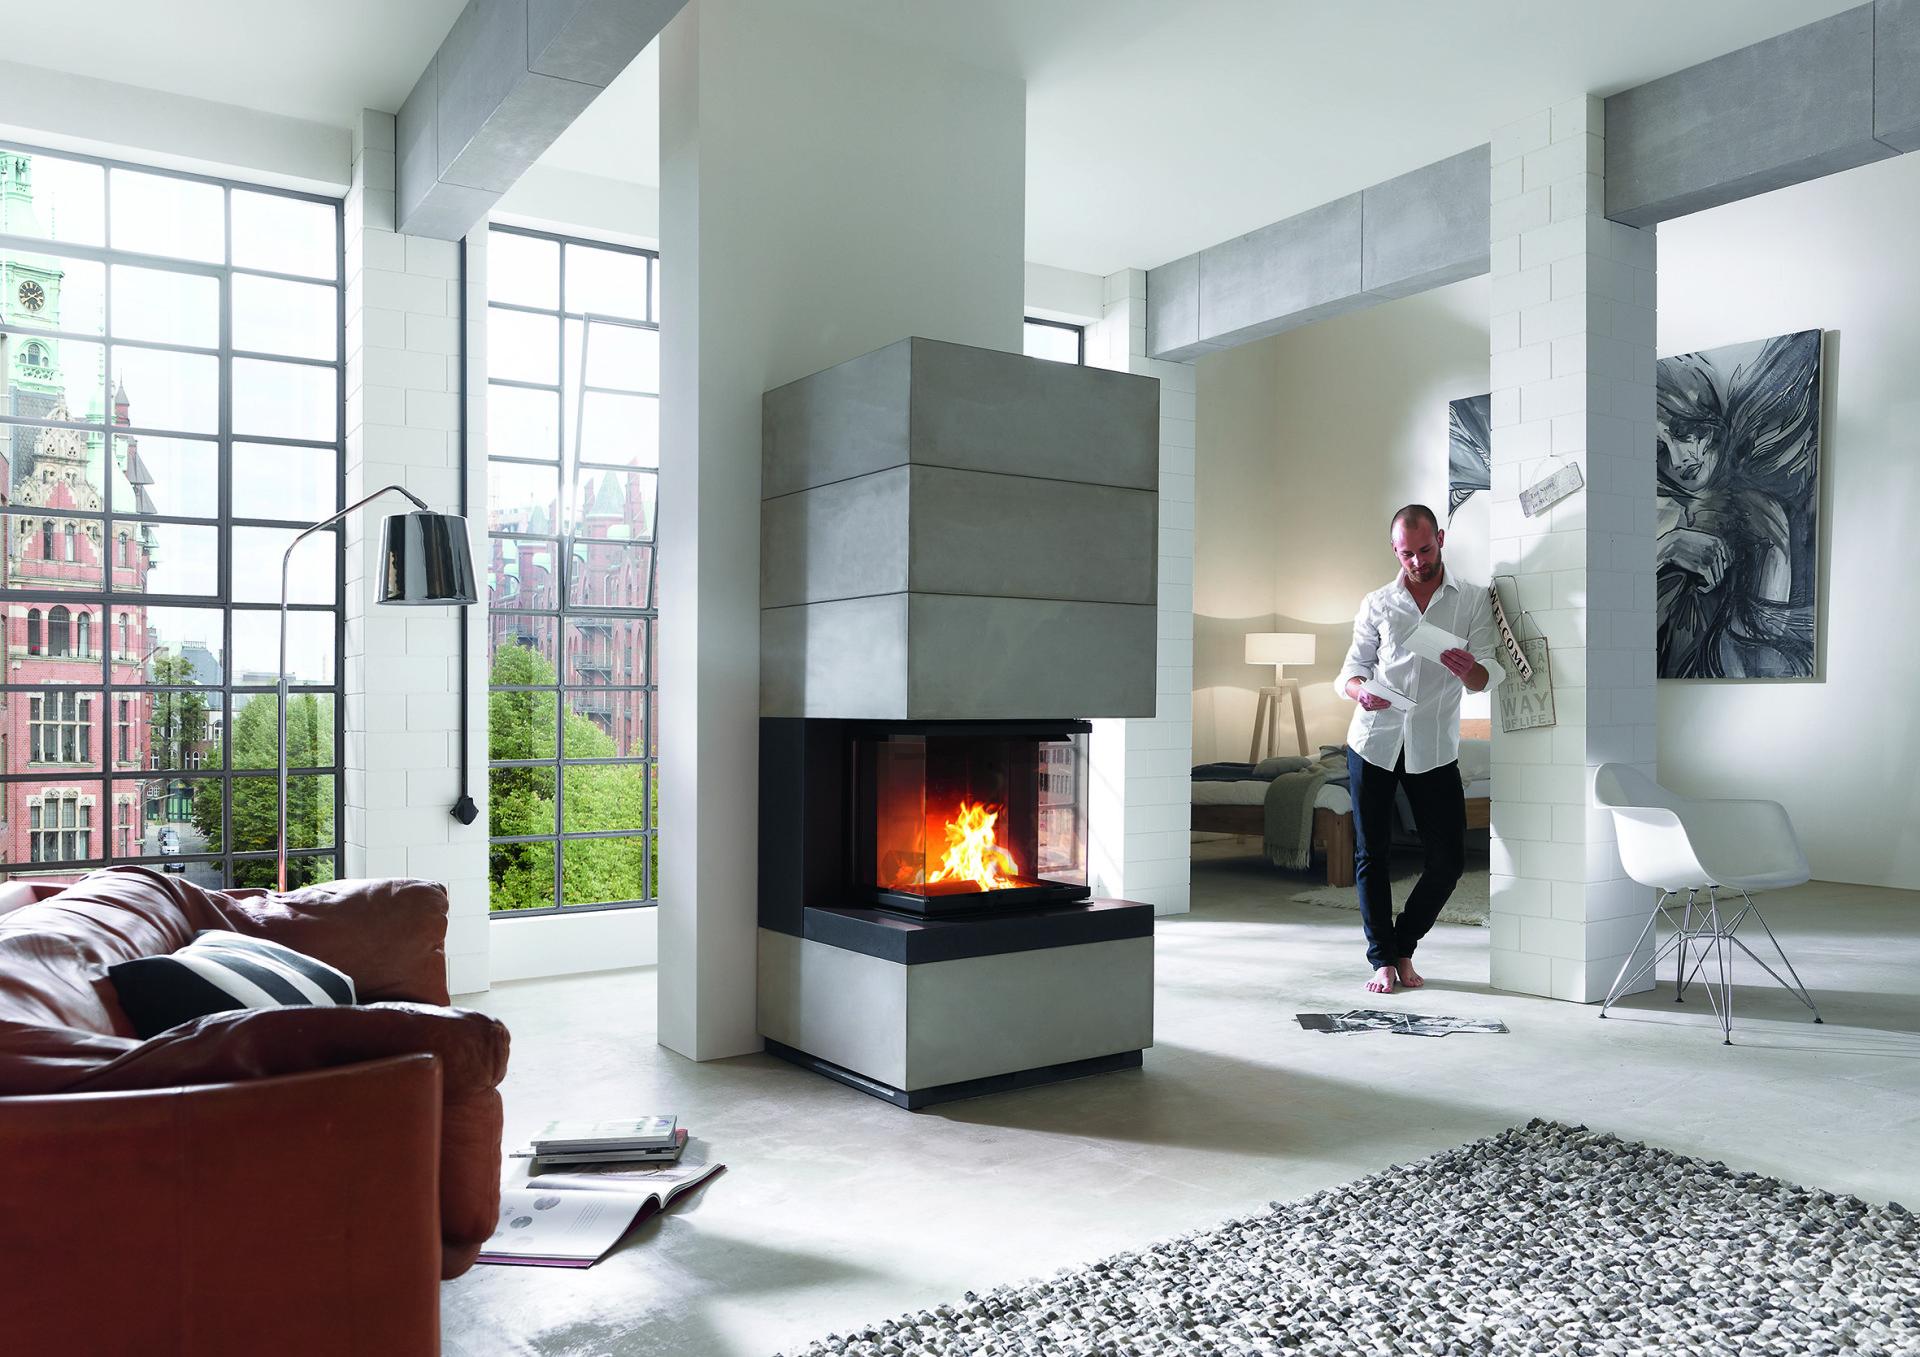 kaminofen bausatz free camina s kurz designbeton anthrazit with kaminofen bausatz latest. Black Bedroom Furniture Sets. Home Design Ideas